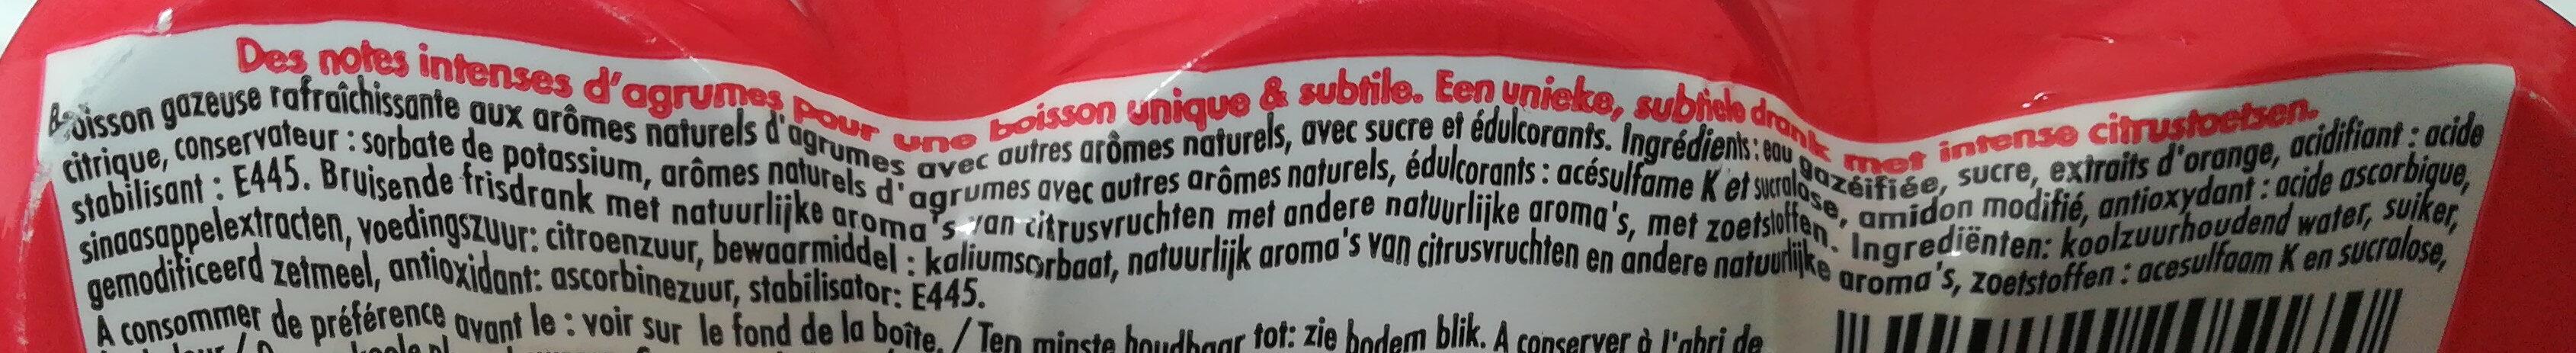 Schweppes agrumes - Ingrédients - fr